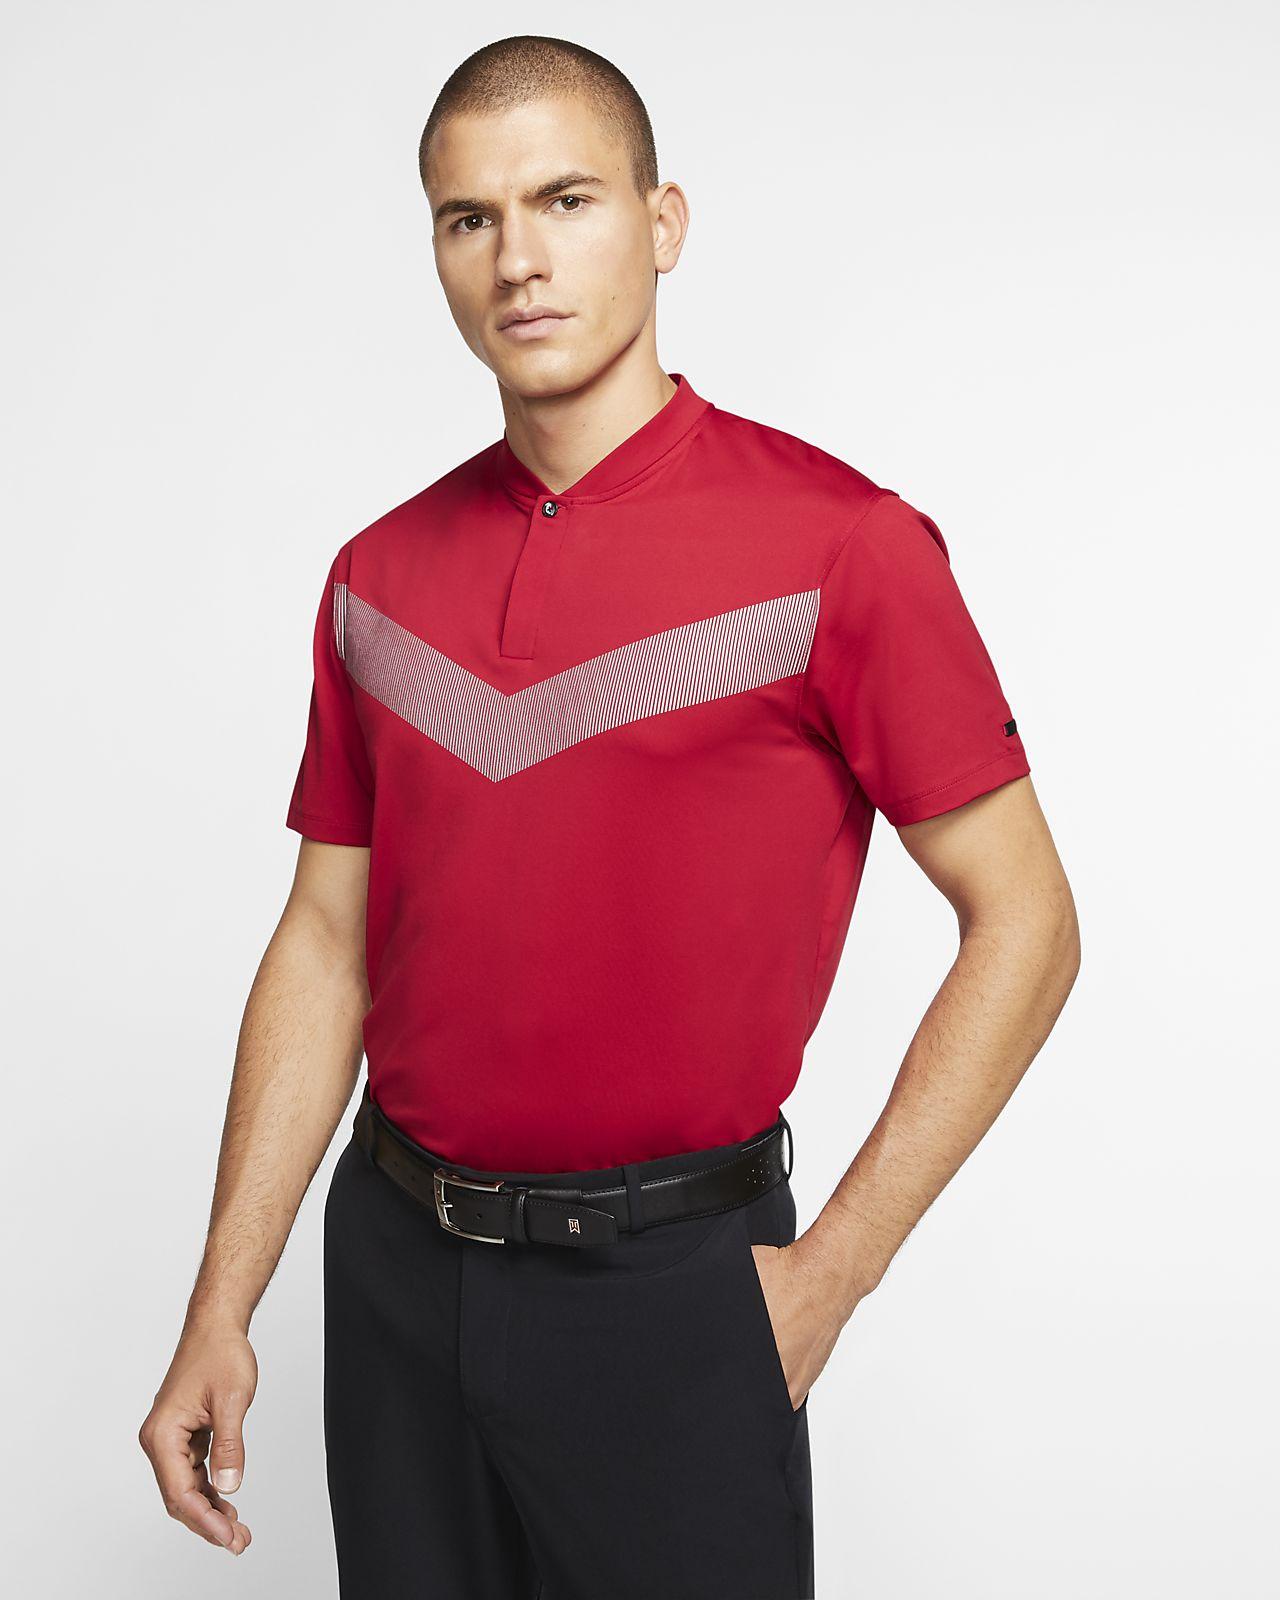 Męska koszulka polo do golfa Nike Dri-FIT Tiger Woods Vapor